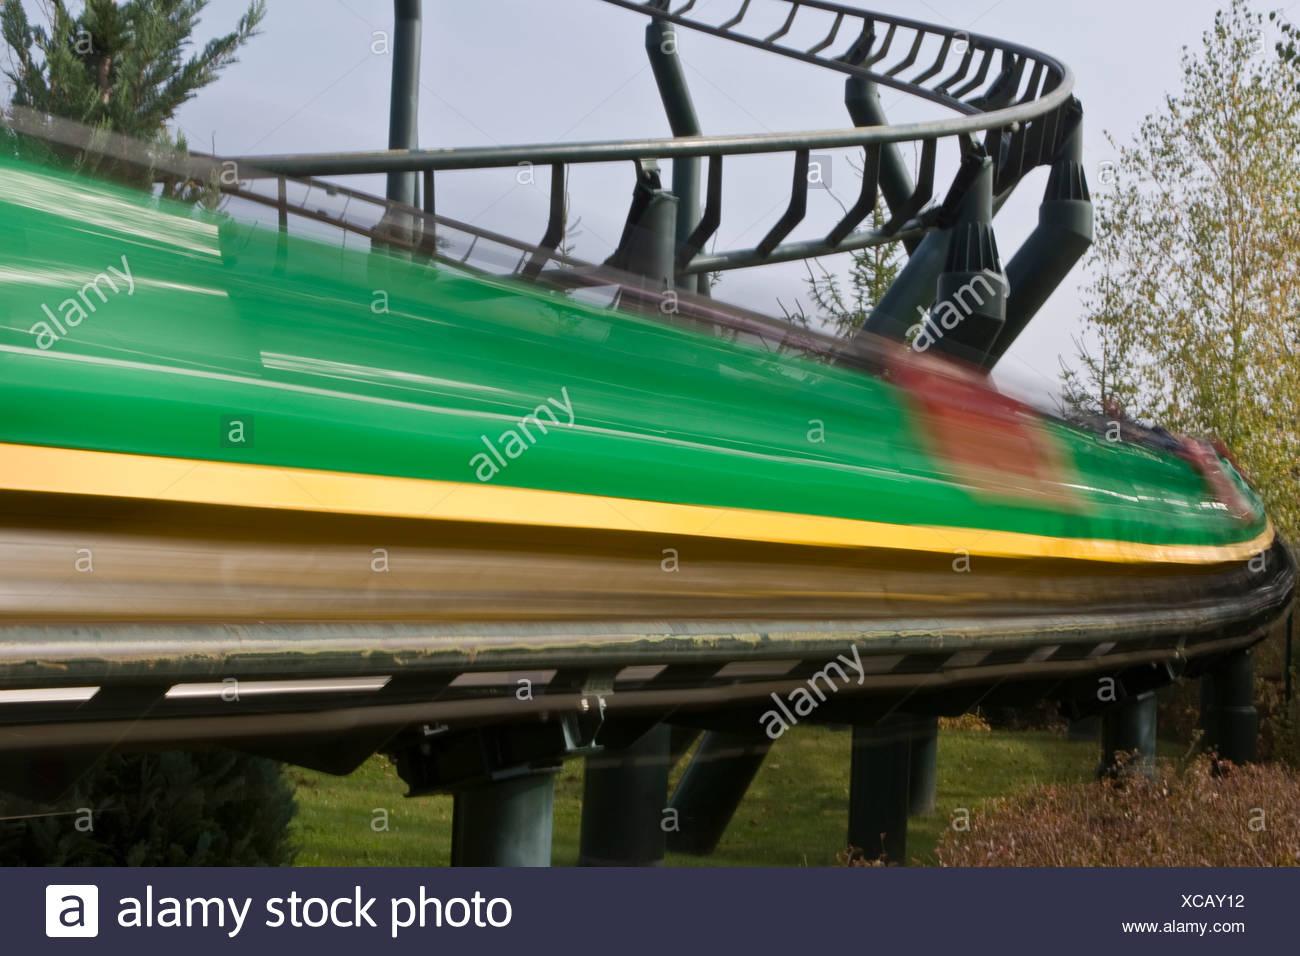 Fast rollercoaster, Legoland, Guenzburg, Bavaria, Germany Stock Photo